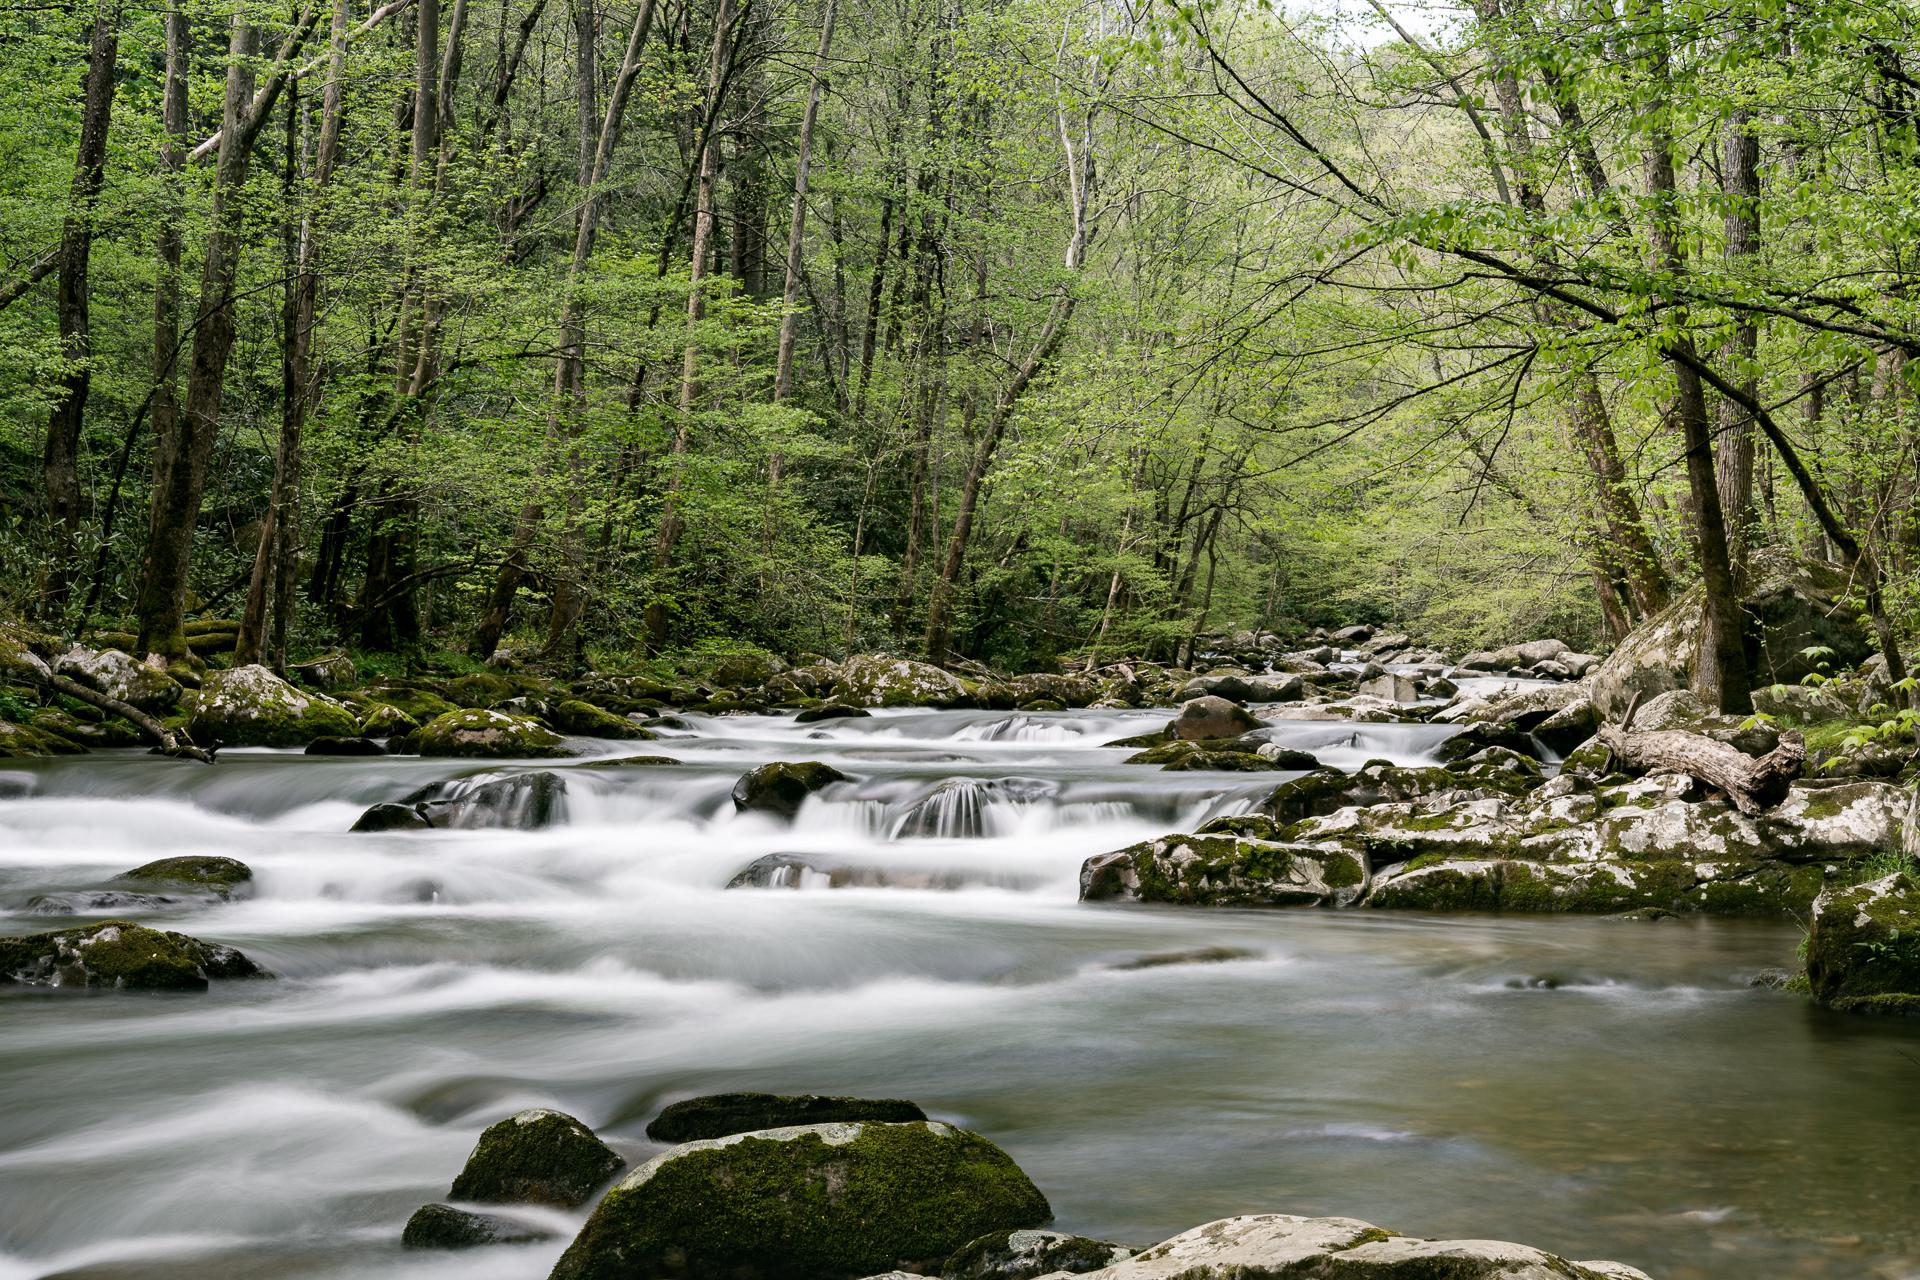 big-creek-gsmnp-great-smoky-mountains-national-park-Kathleen-Kathy-Roberts-Asheville-NC-Photographer-3.jpg